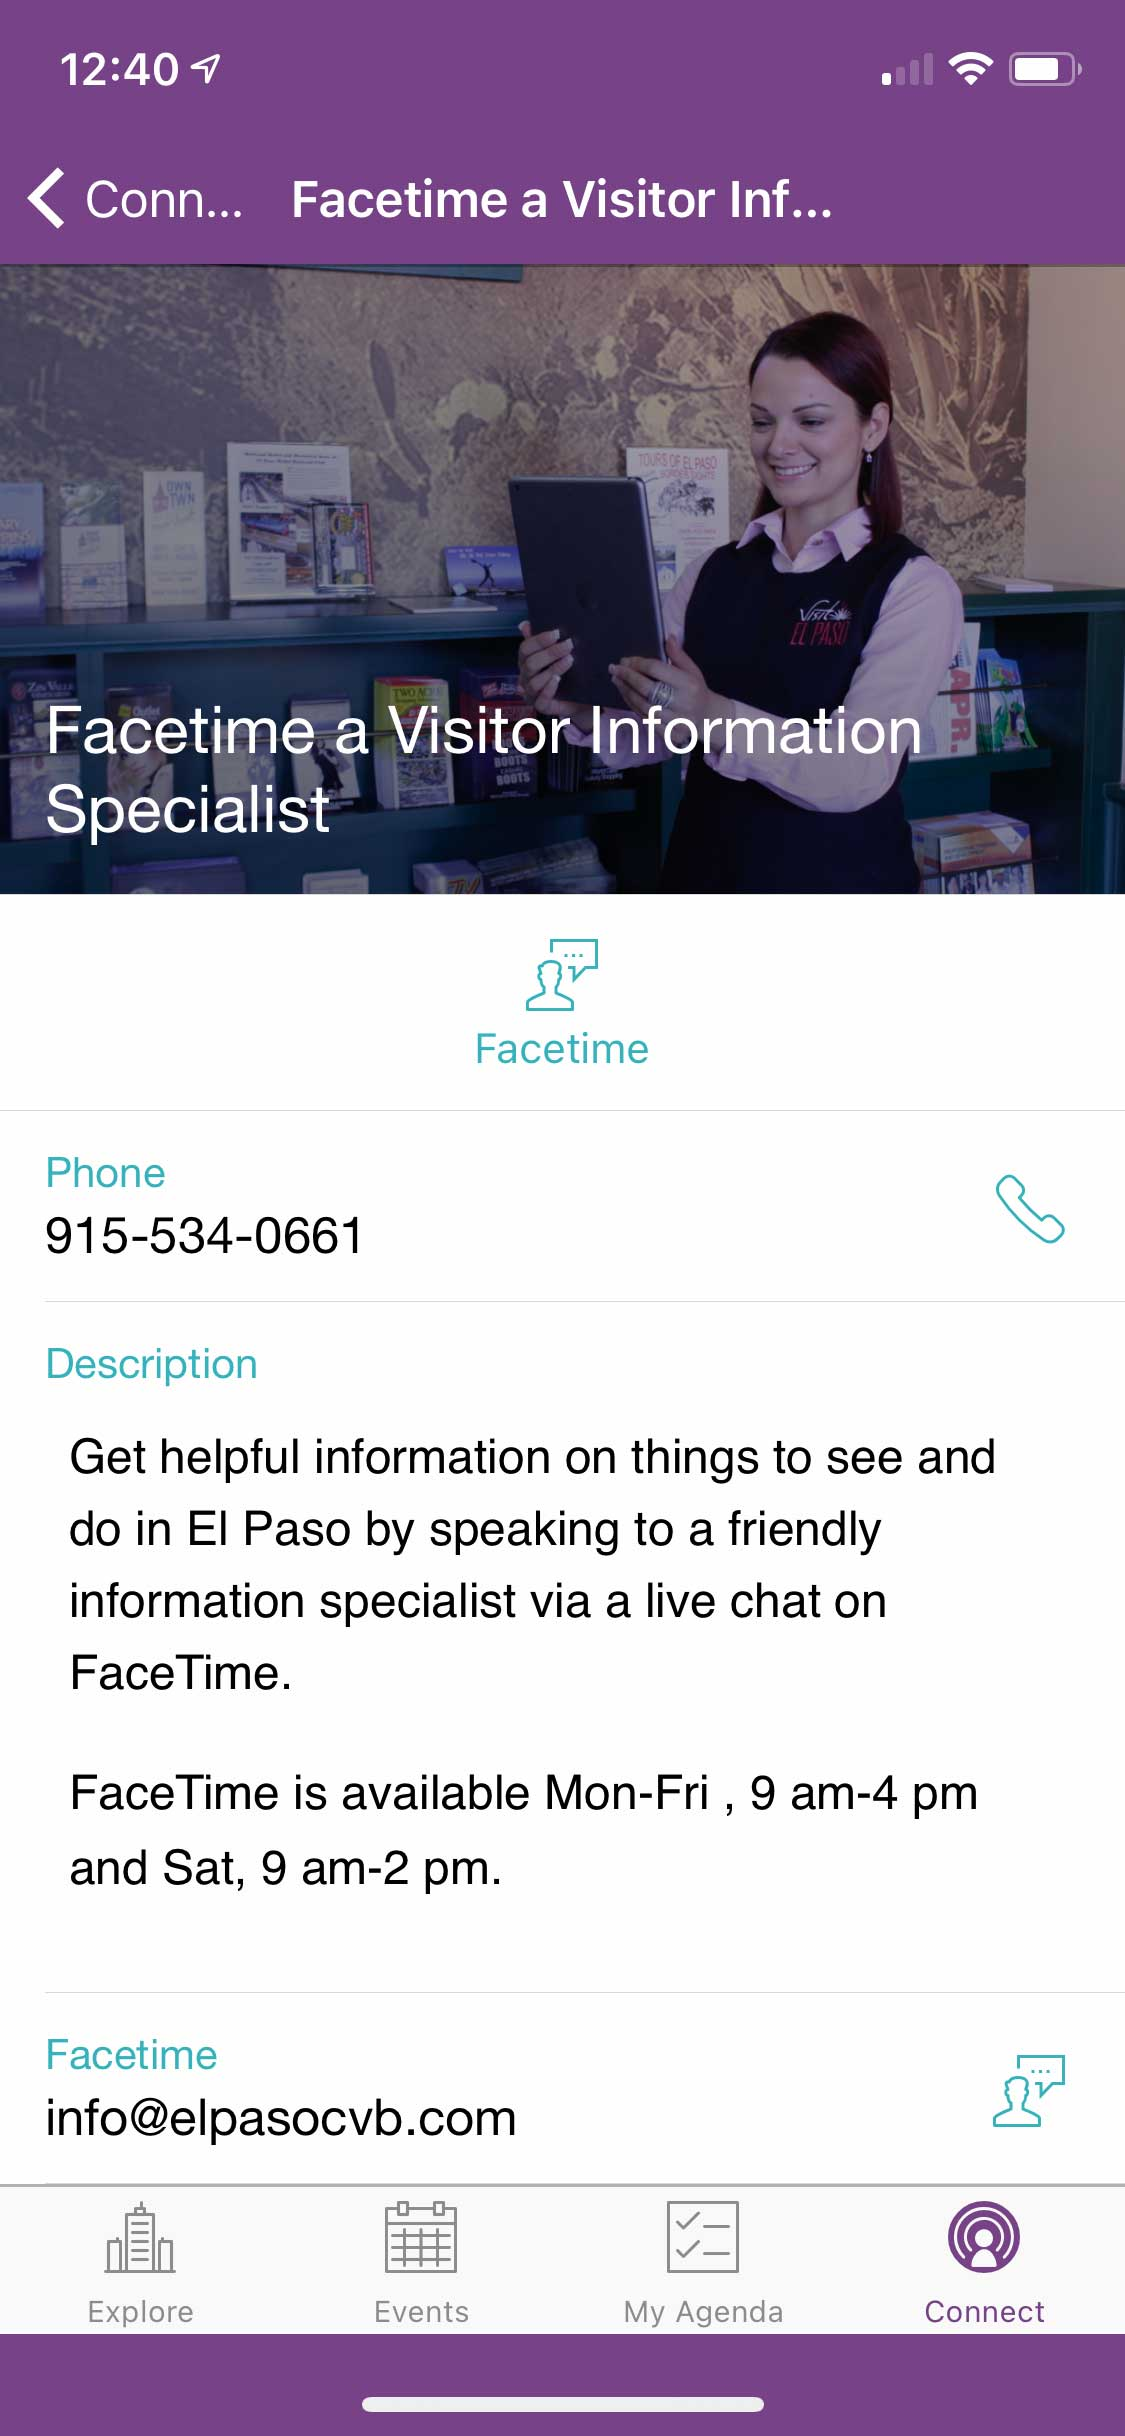 Visit El Paso App Facetime Help